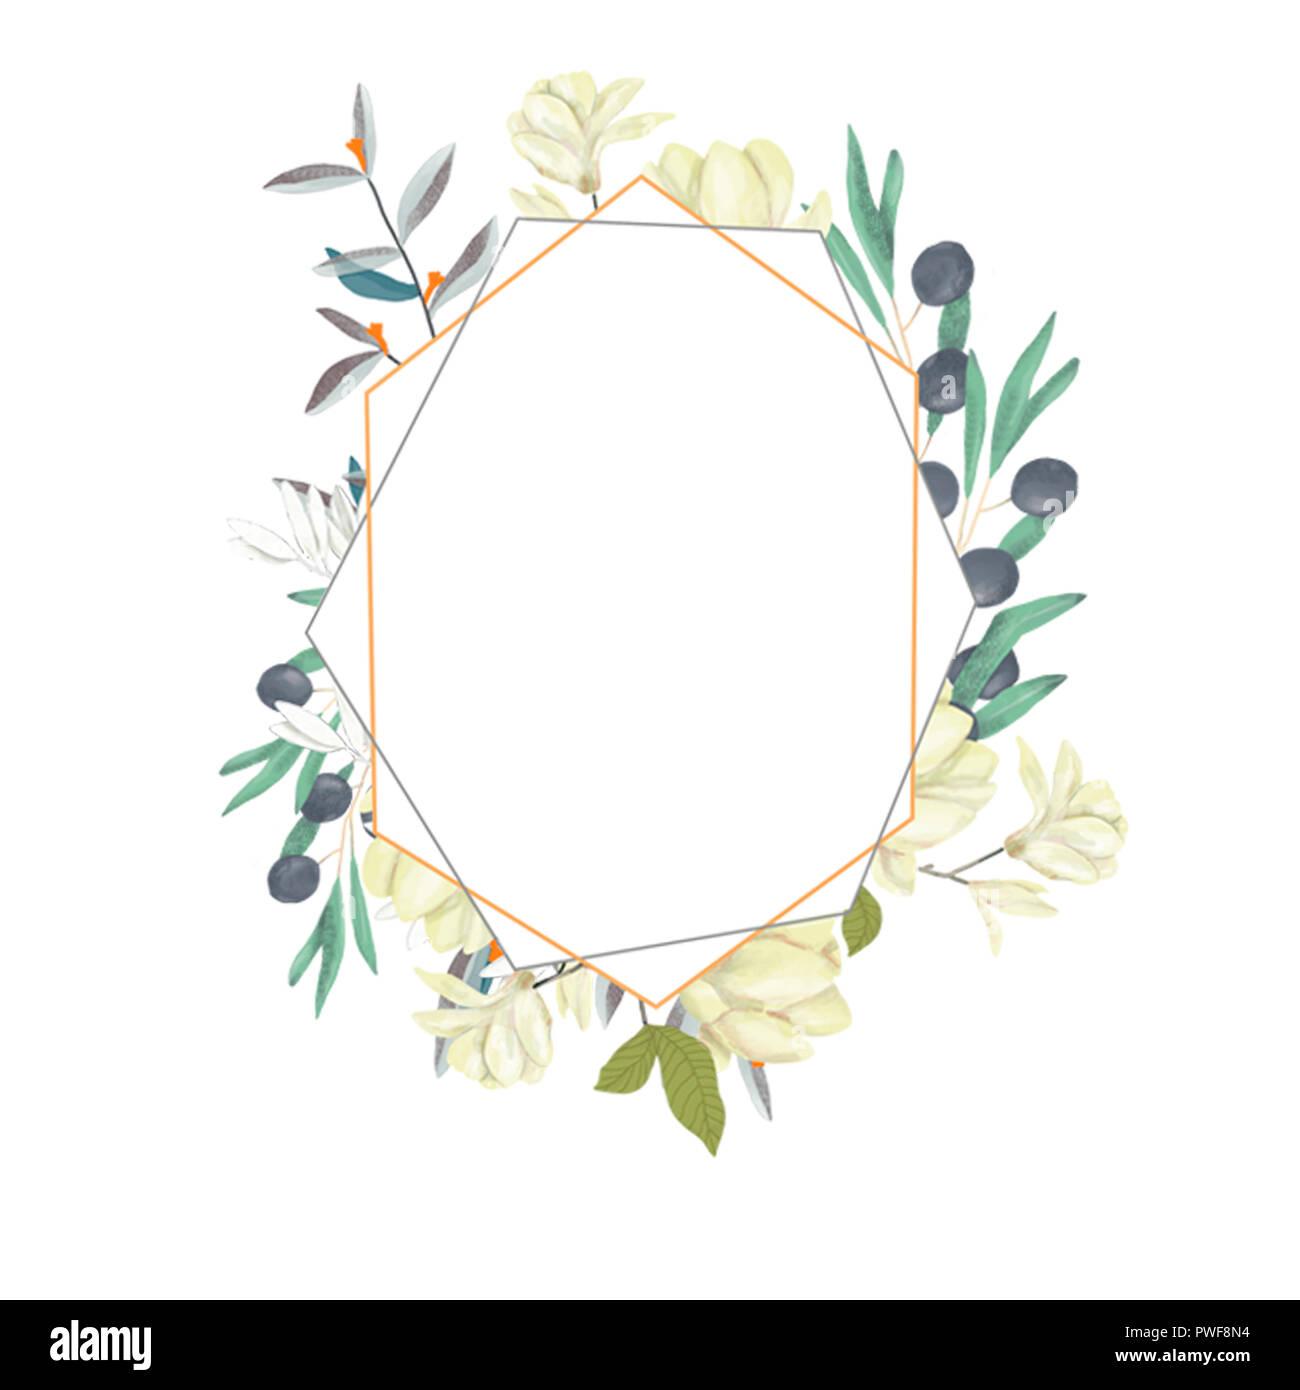 https www alamyimages fr invitation de mariage carte d olive inviter floral floral et geometrique magnolia cadre dore imprimer fond blanc image222226960 html